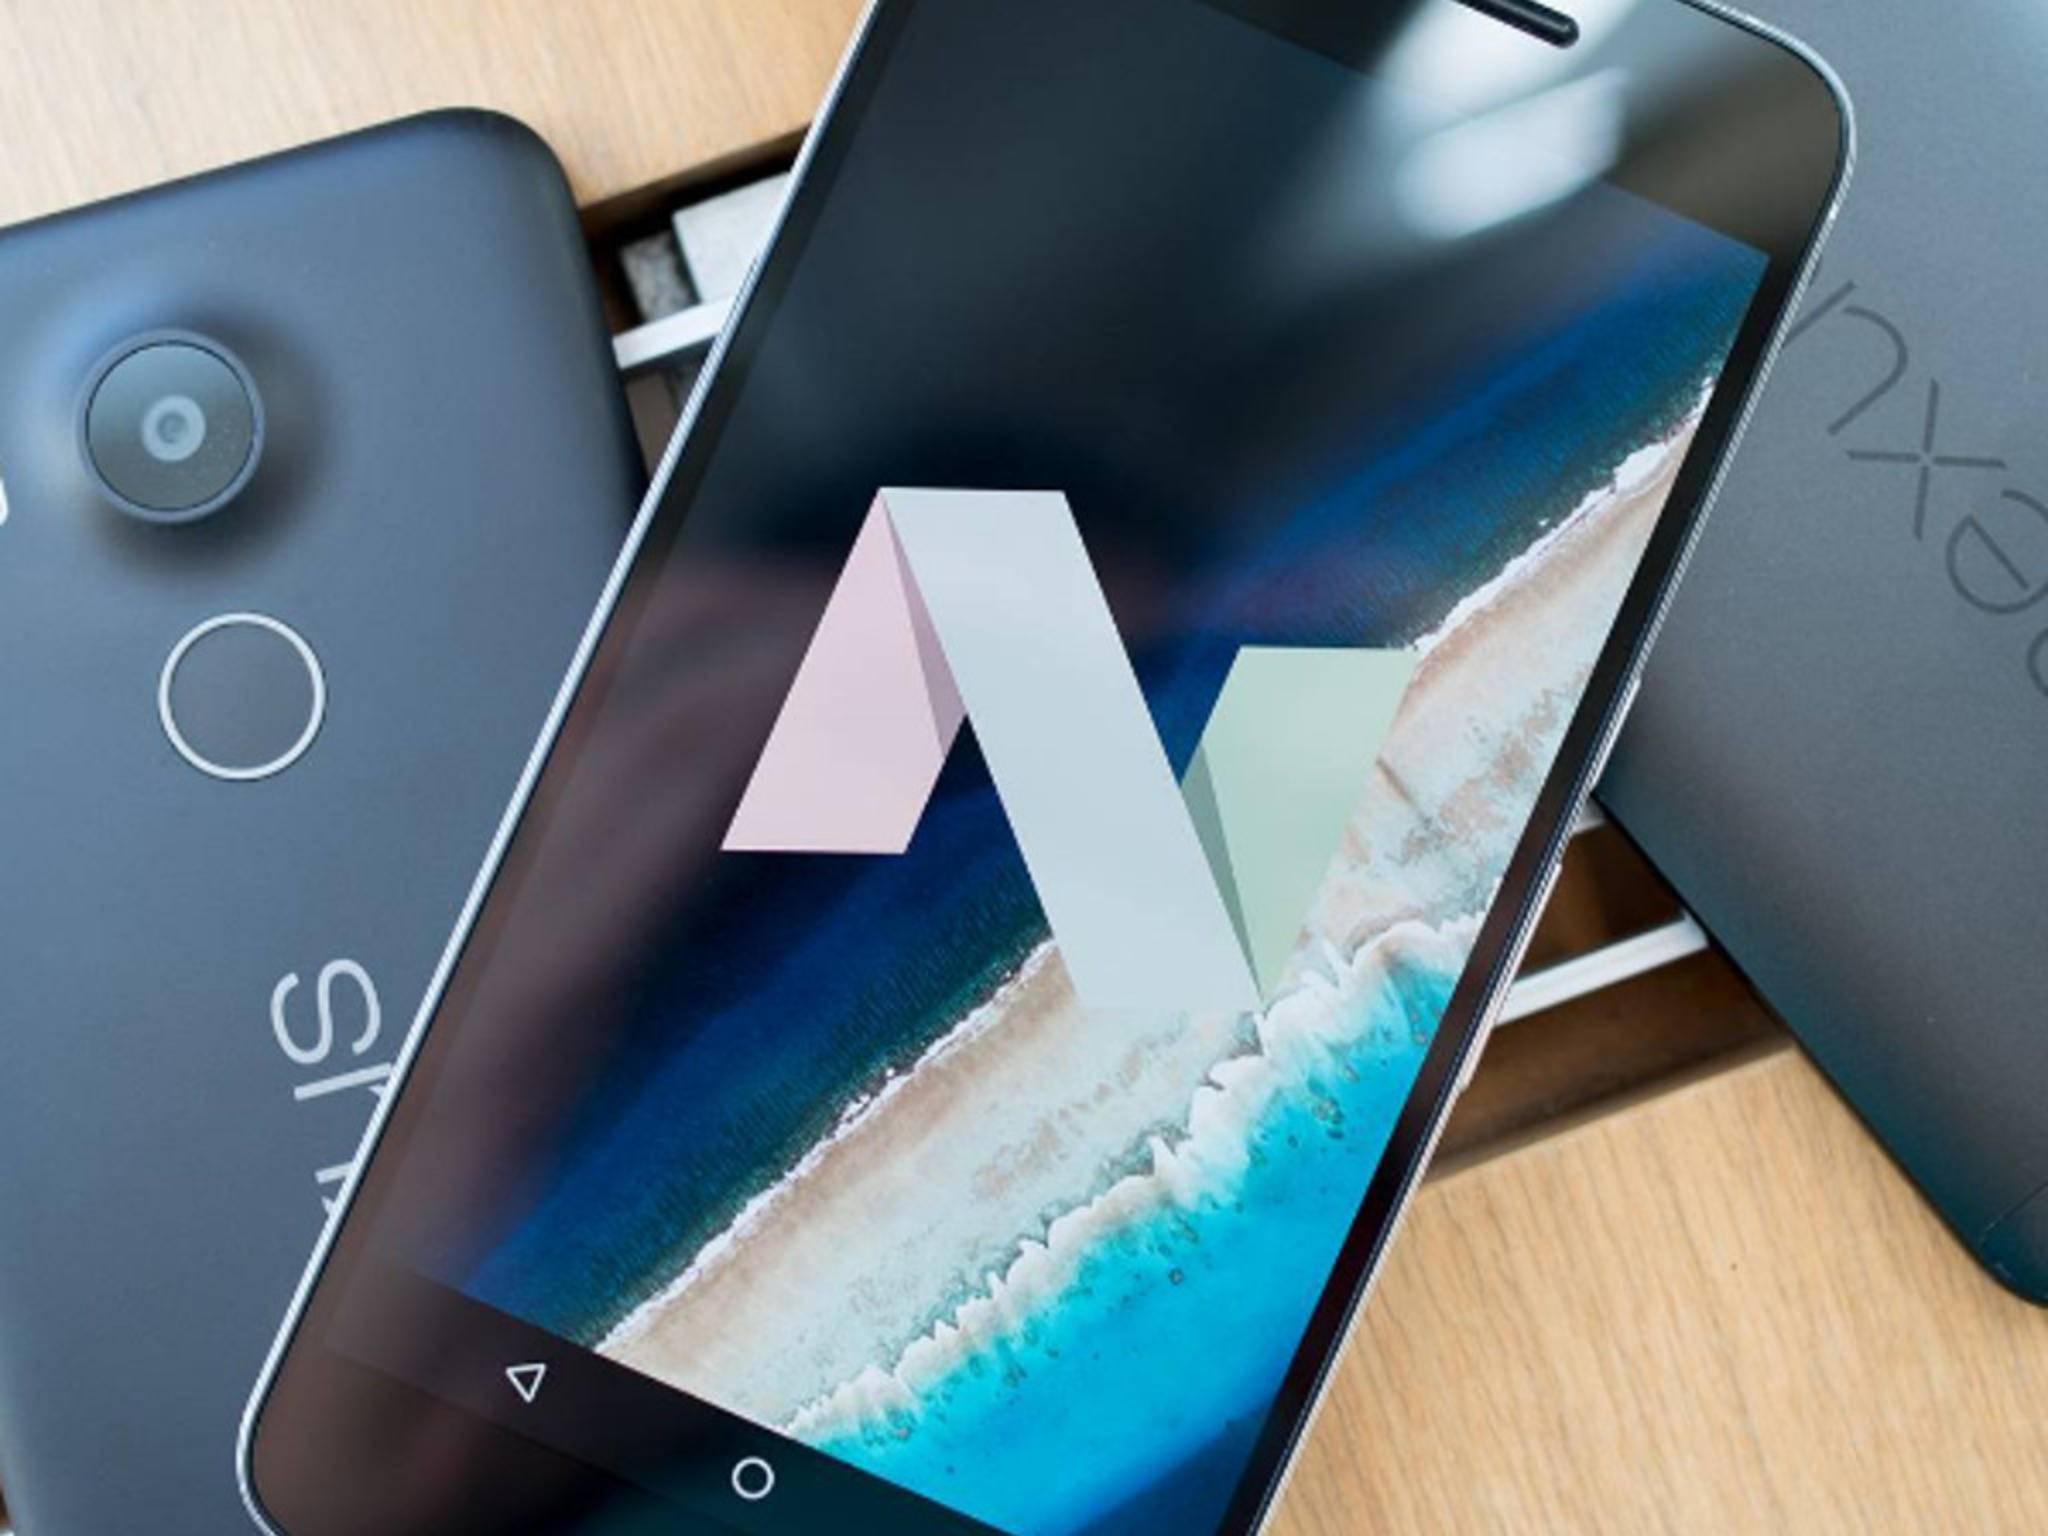 Endlich da: Android 7.0 Nougat.